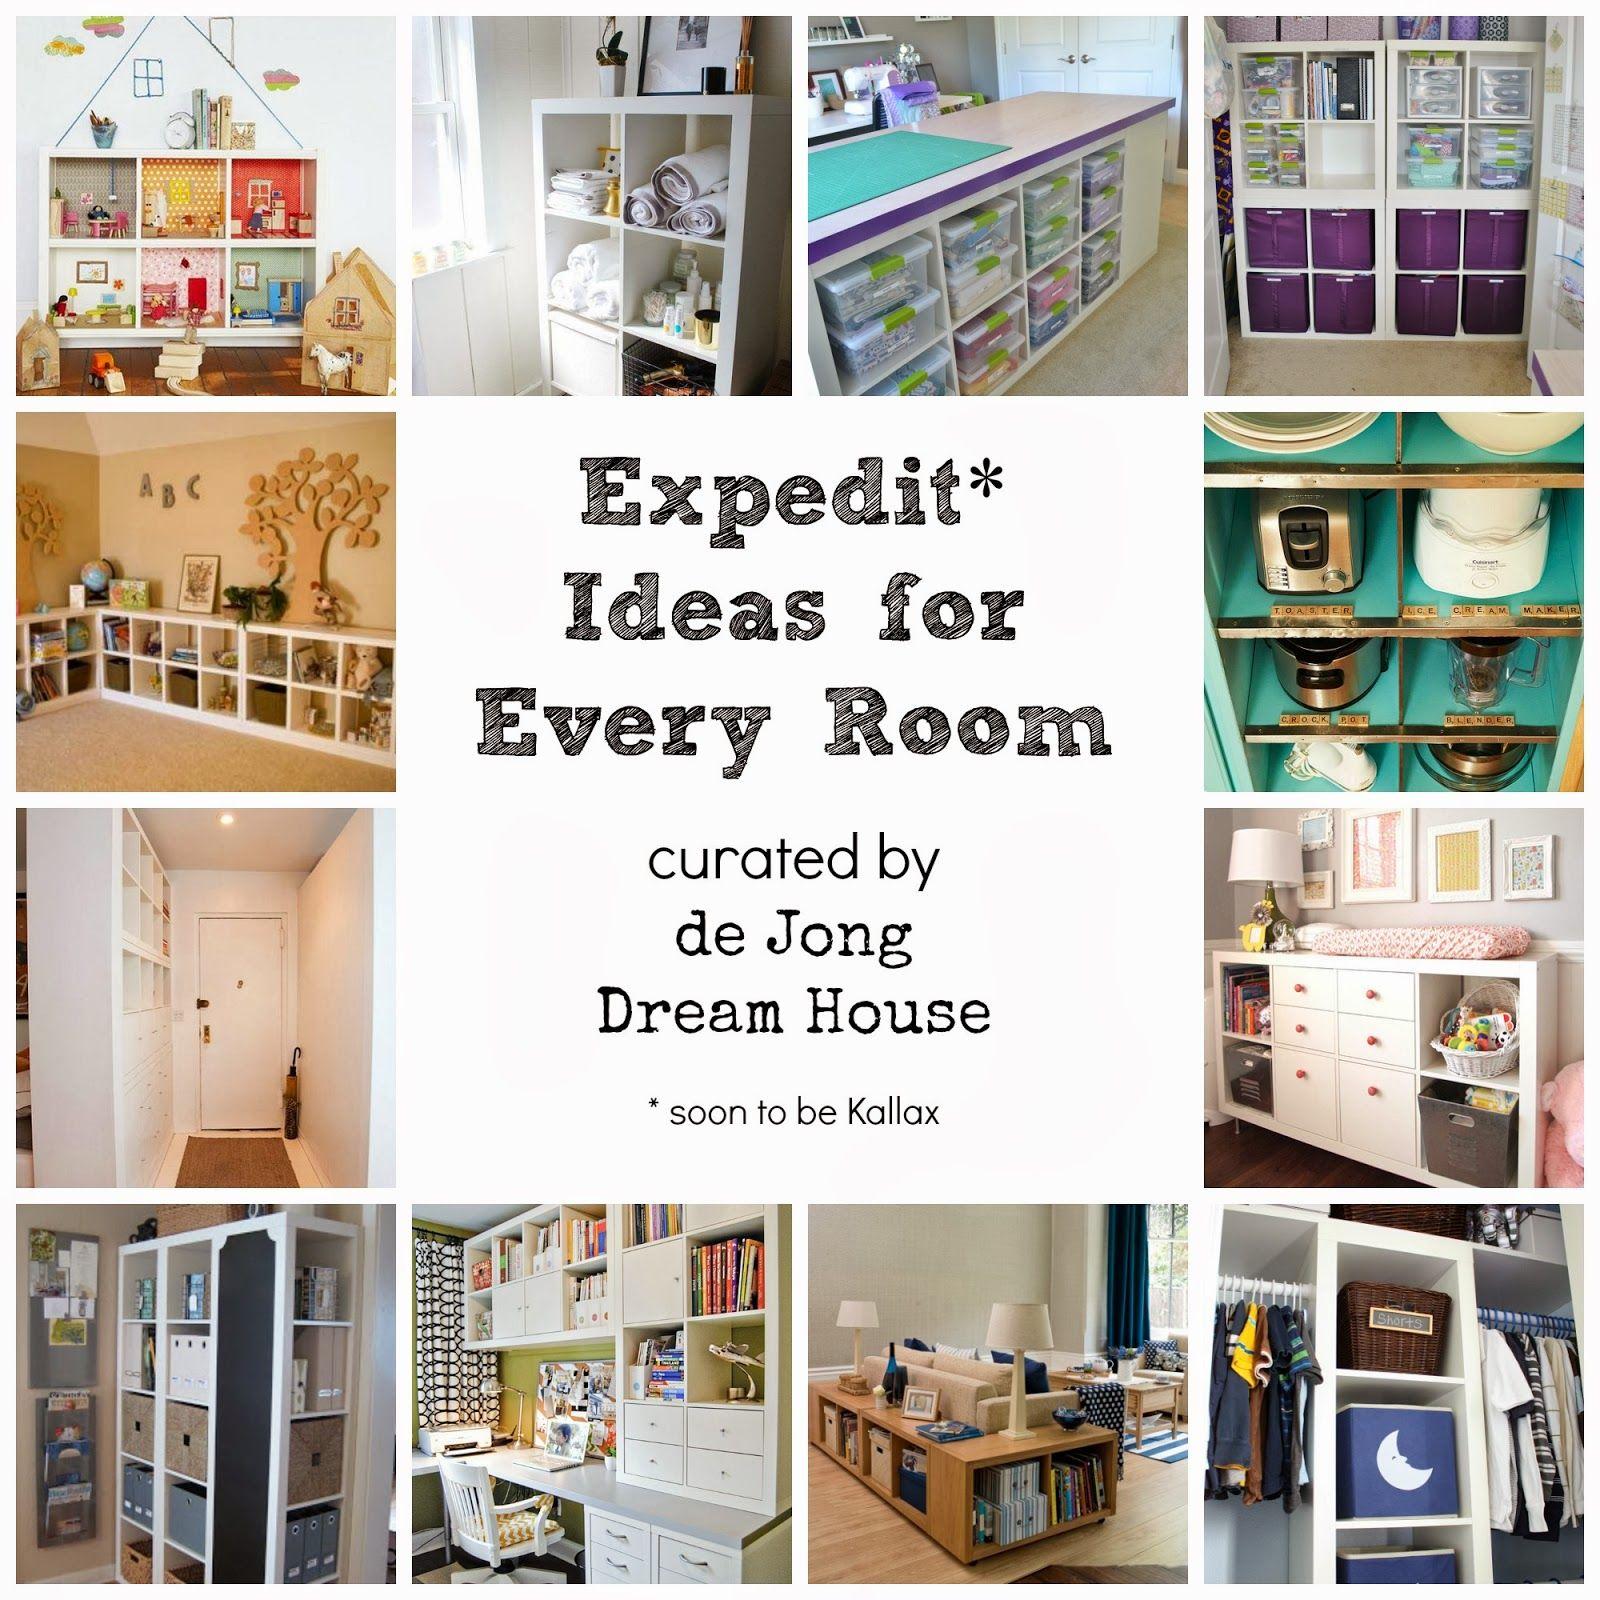 De jong dream house expedit ideas for every room diys crafts